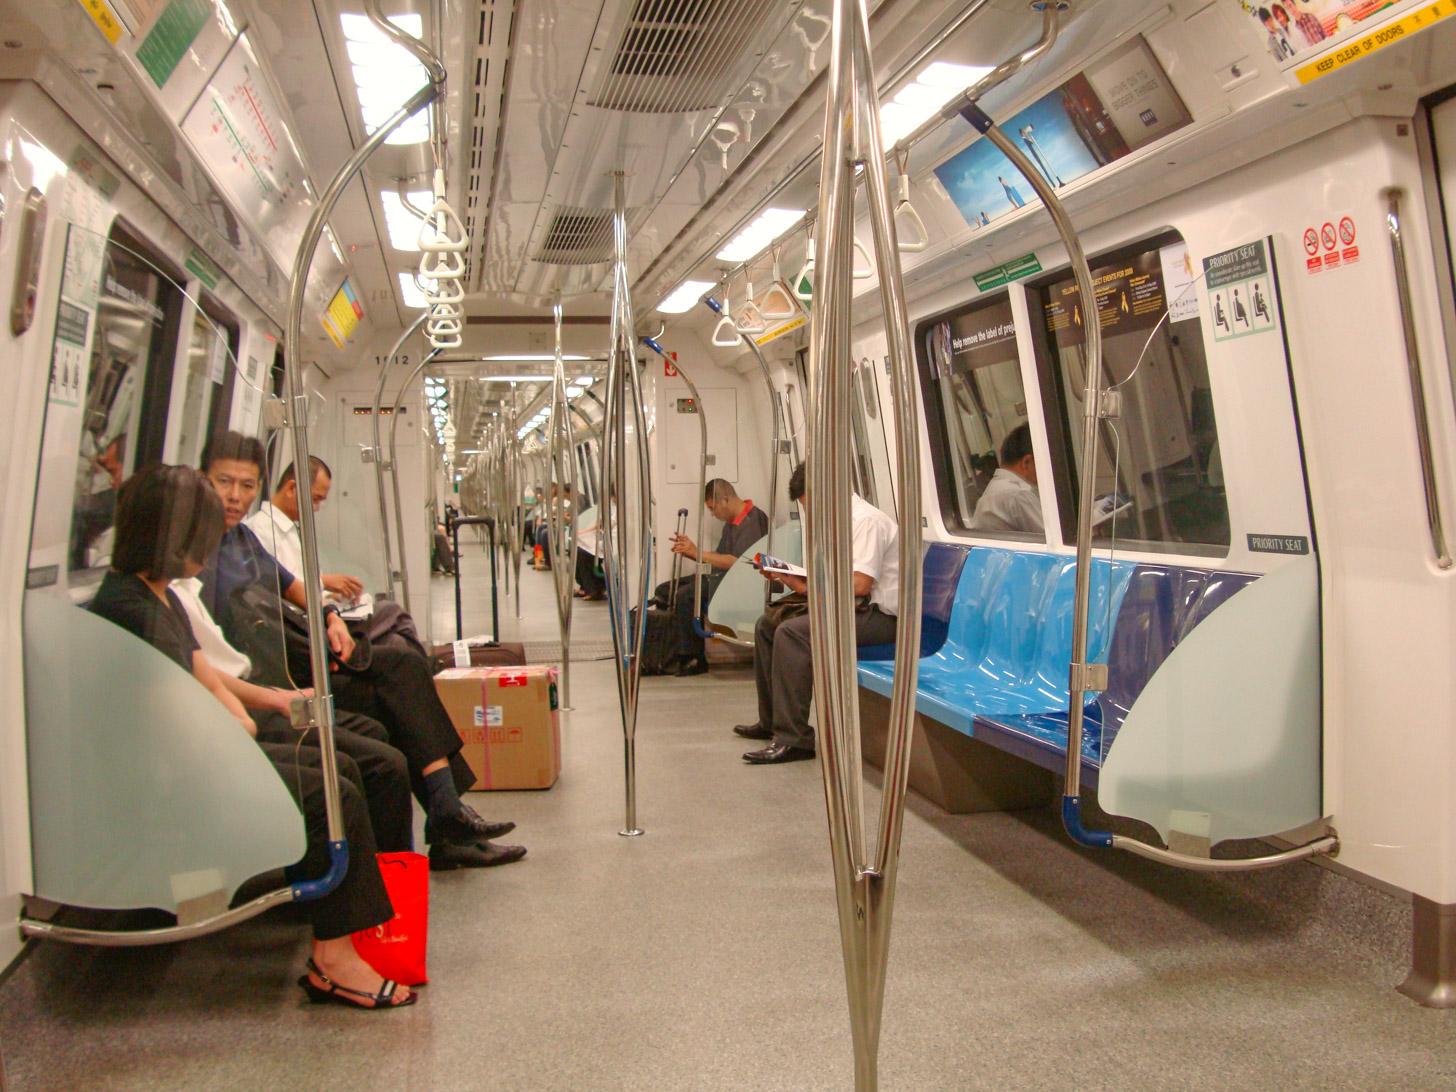 De MRT oftewel de metro in Singapore